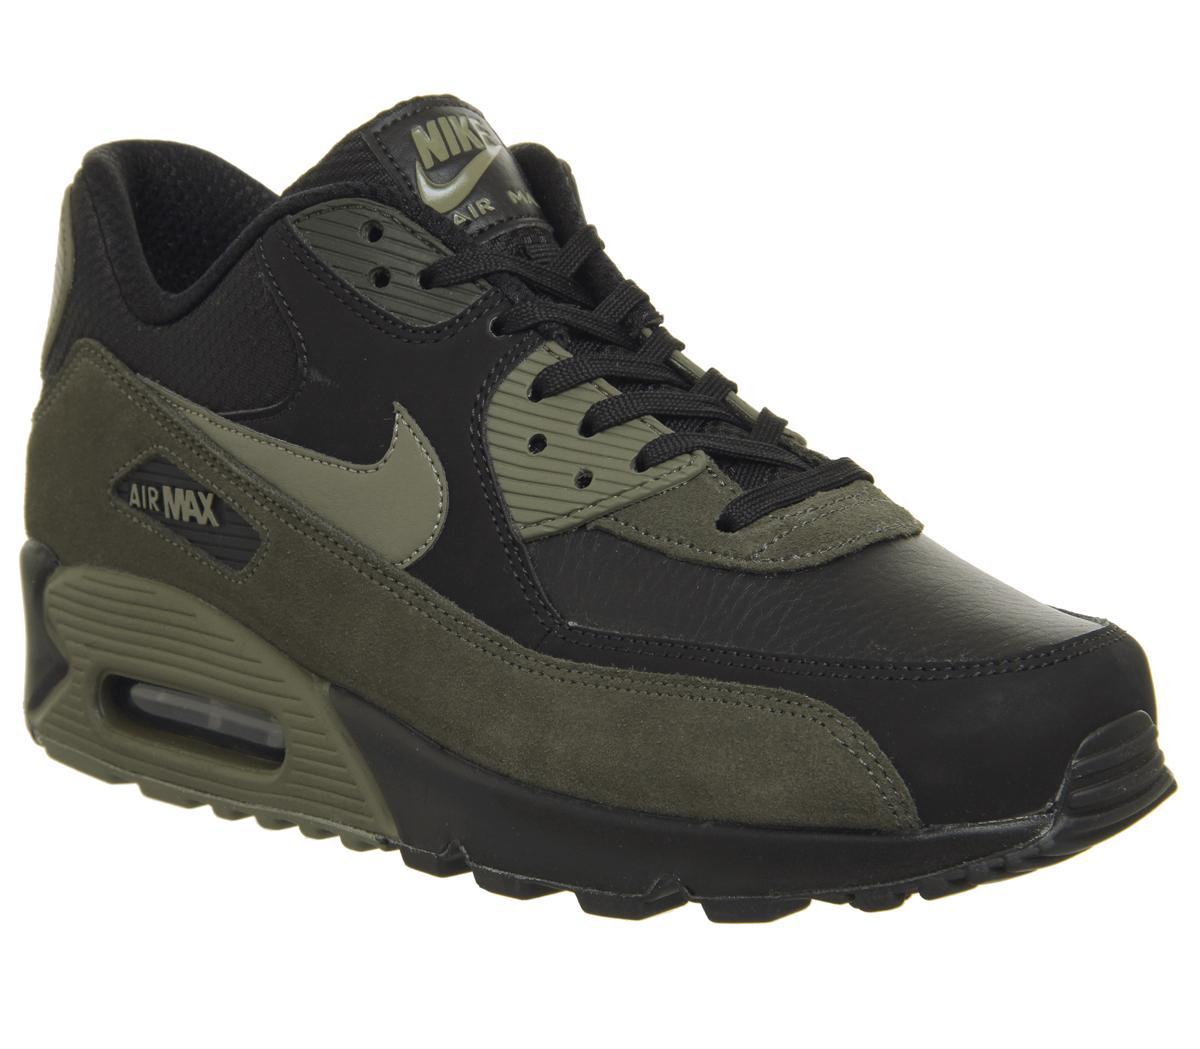 Nike Air Max 90 Trainers Black Medium